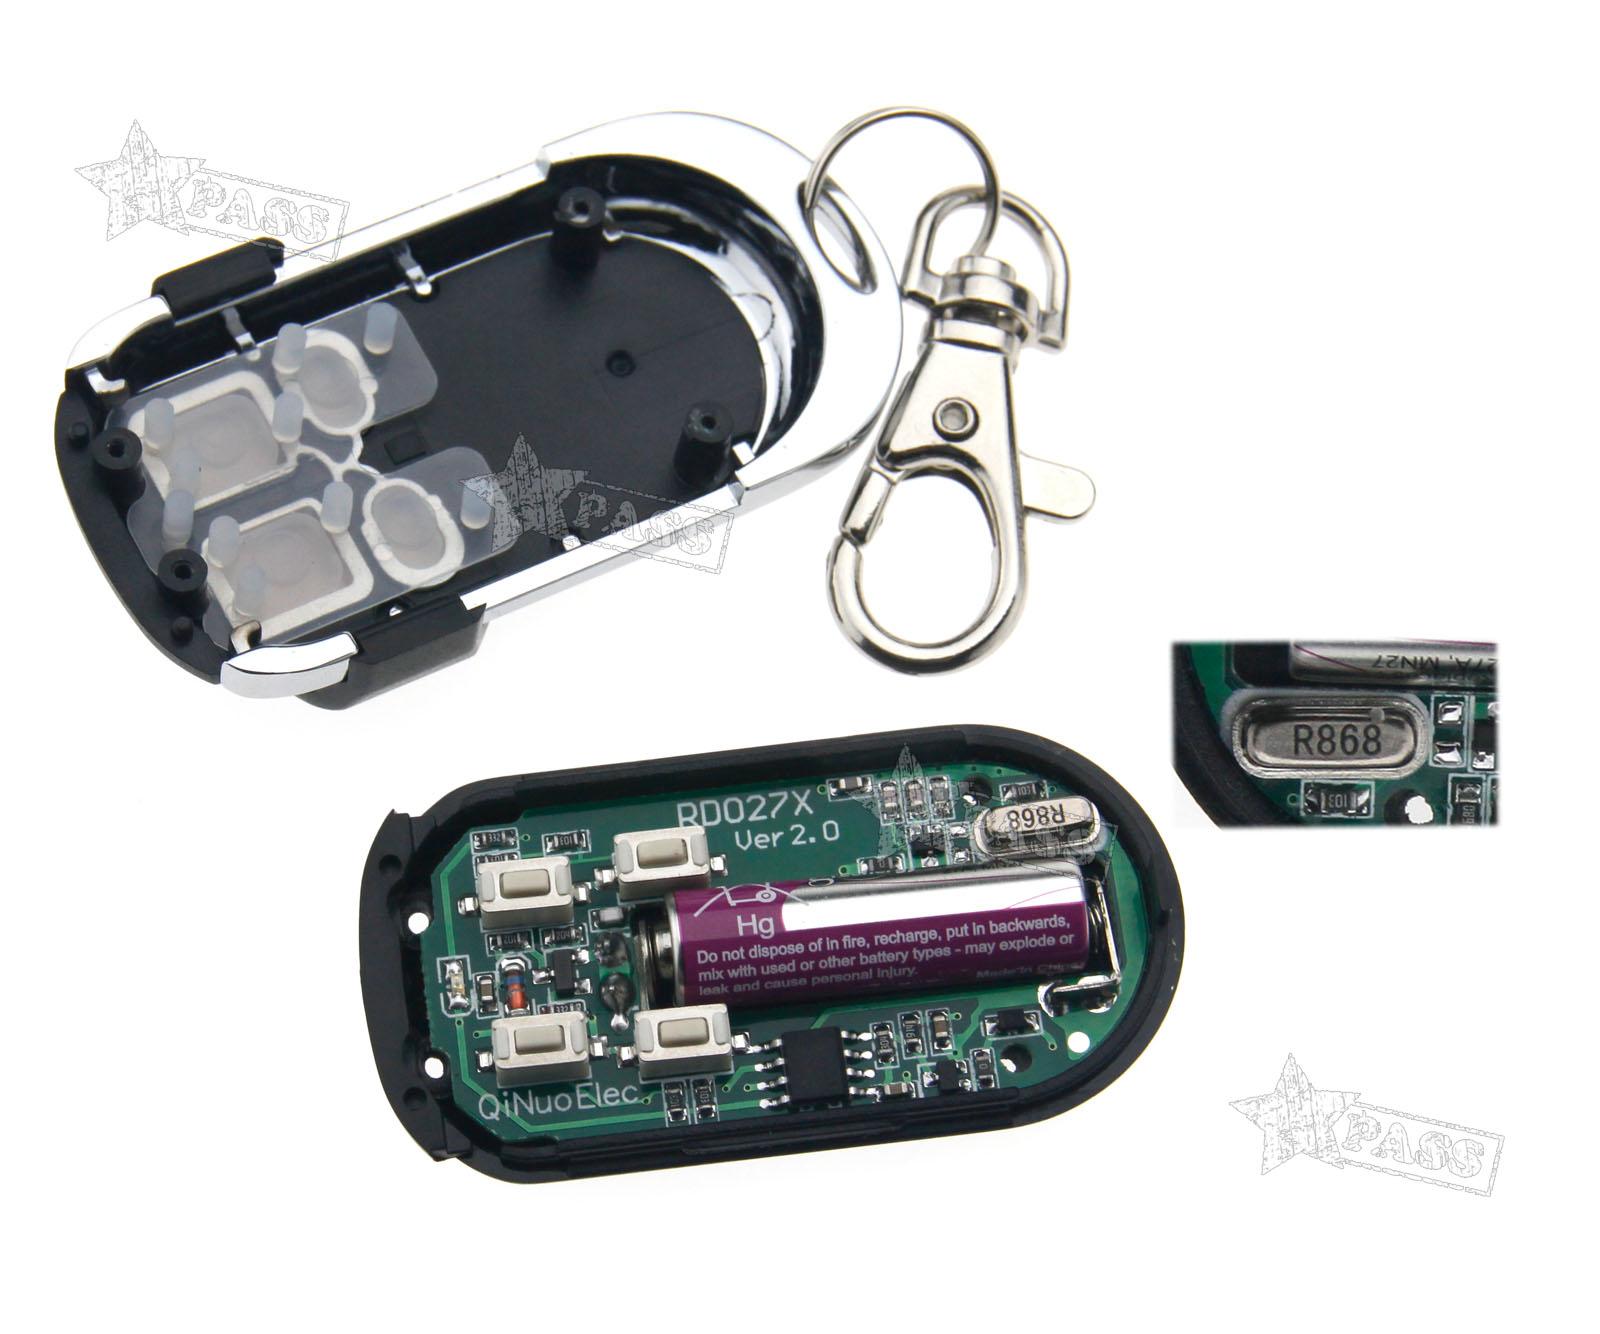 1pc 868 3mhz Copy Code Cloning Electronic Key Fob Garage